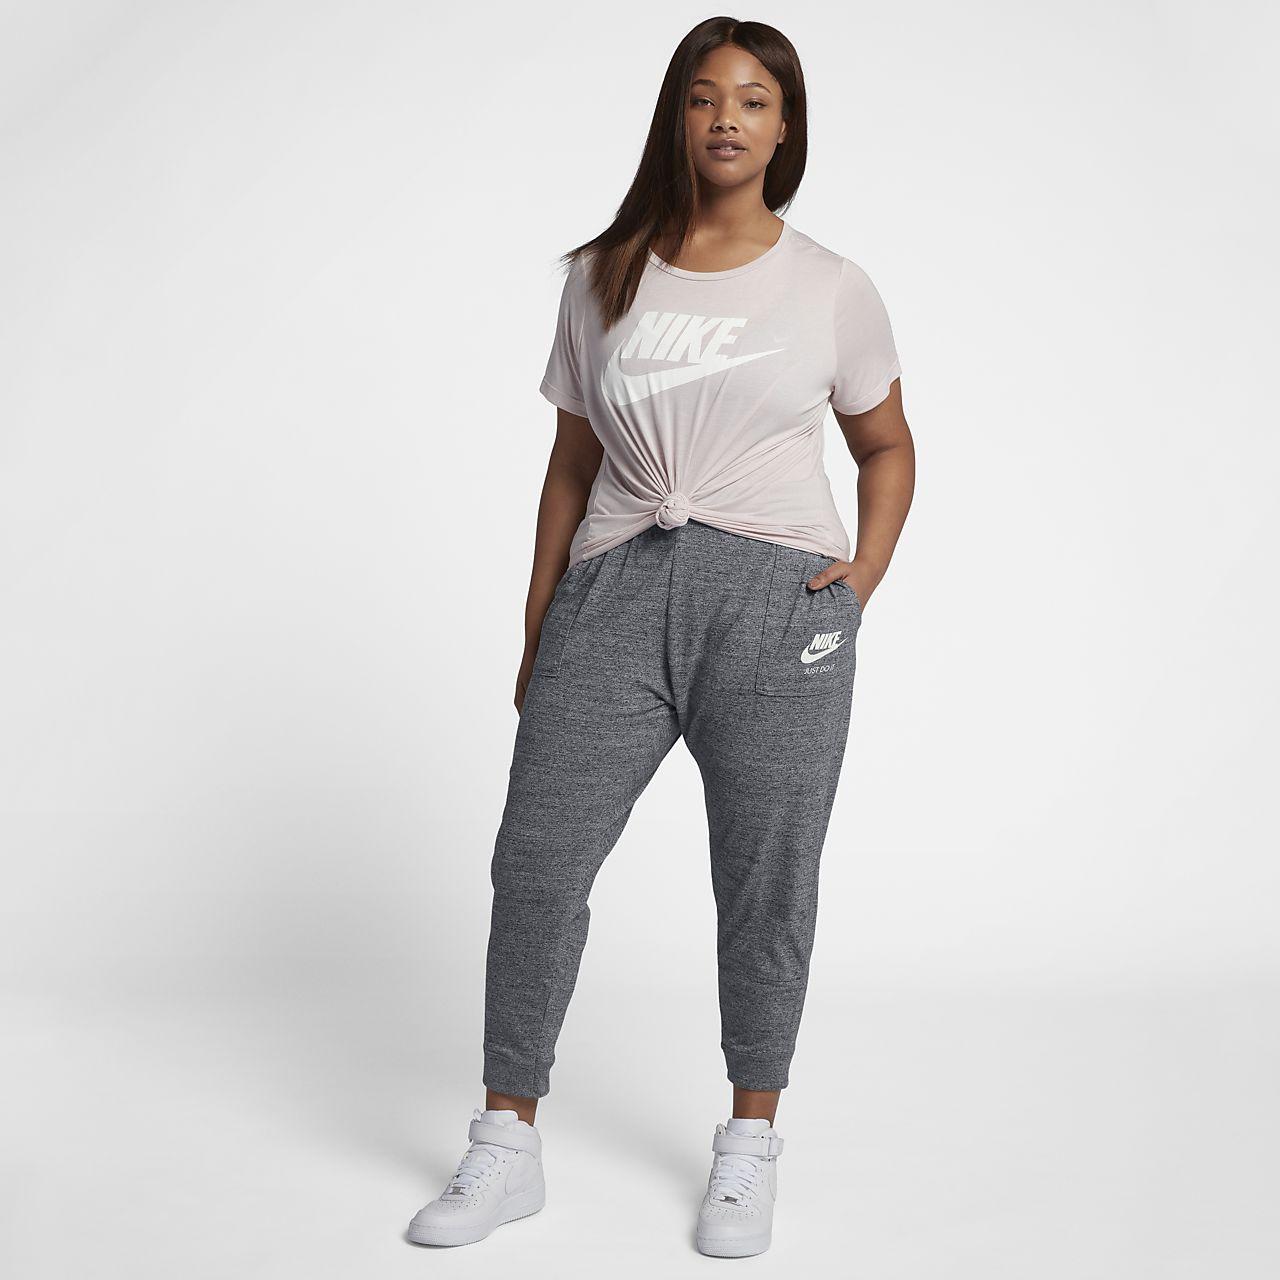 Nike Sportswear Vintage Plus Size Womens Capris Nike